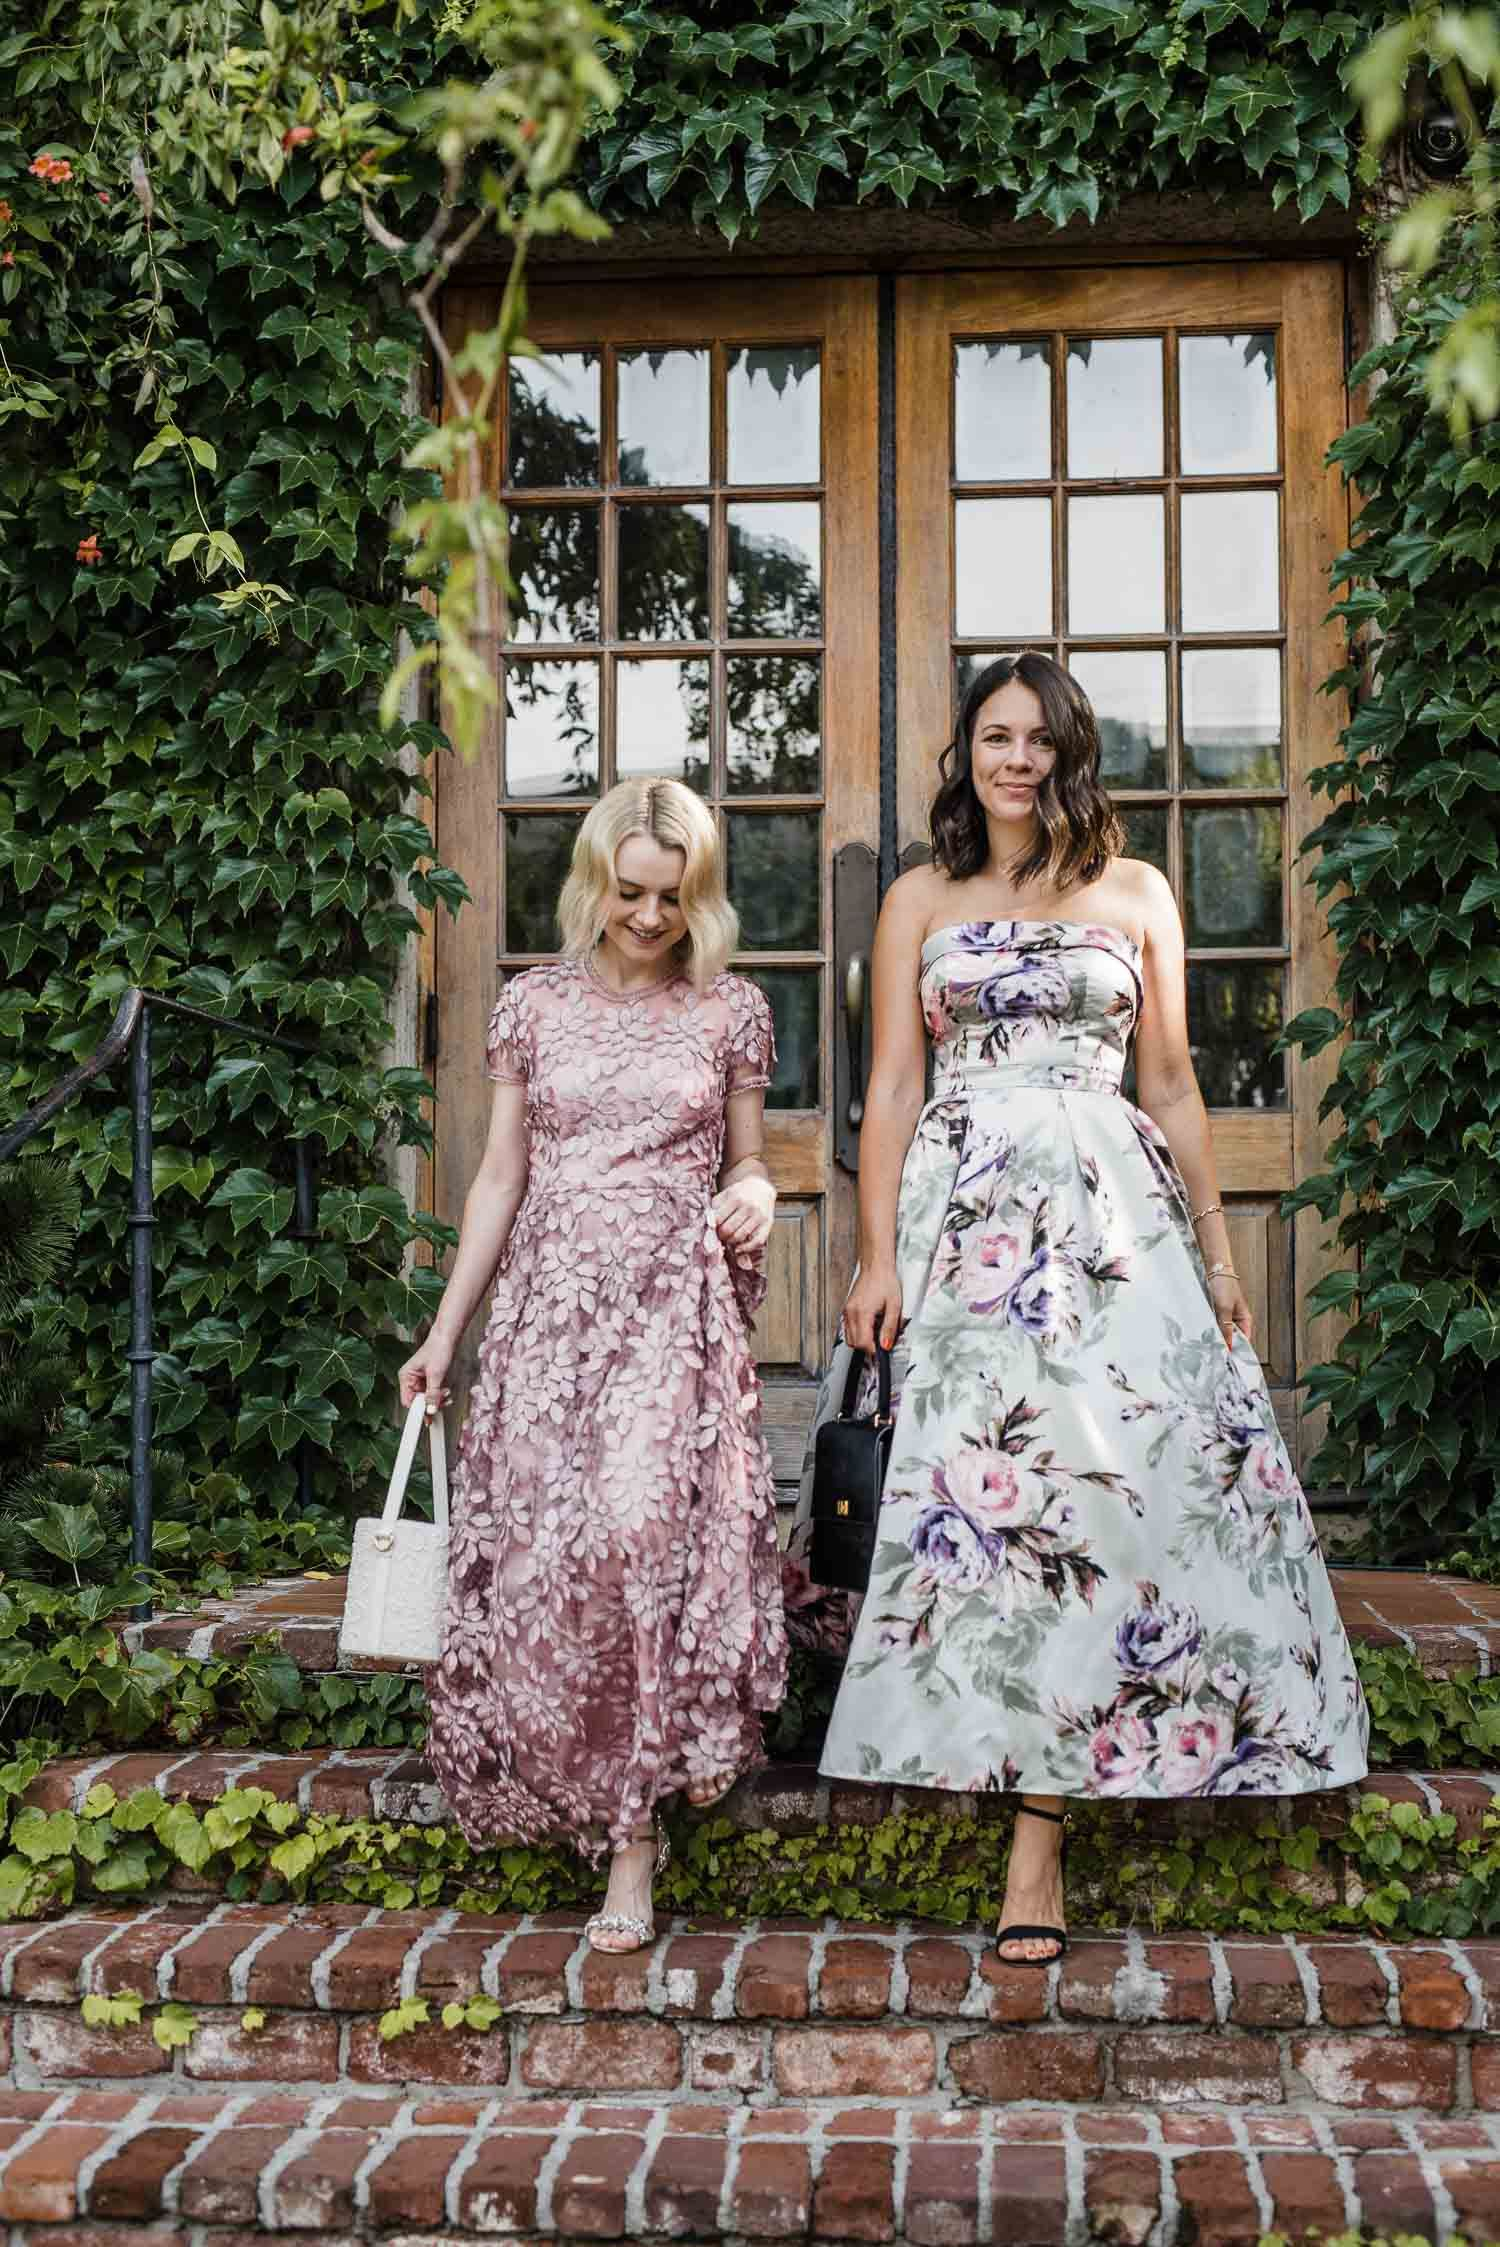 The Best Of Formal Wedding Guest Attire Ideas Formal Wedding Guest Dress Formal Wedding Guest Attire Wedding Attire Guest [ 2247 x 1500 Pixel ]